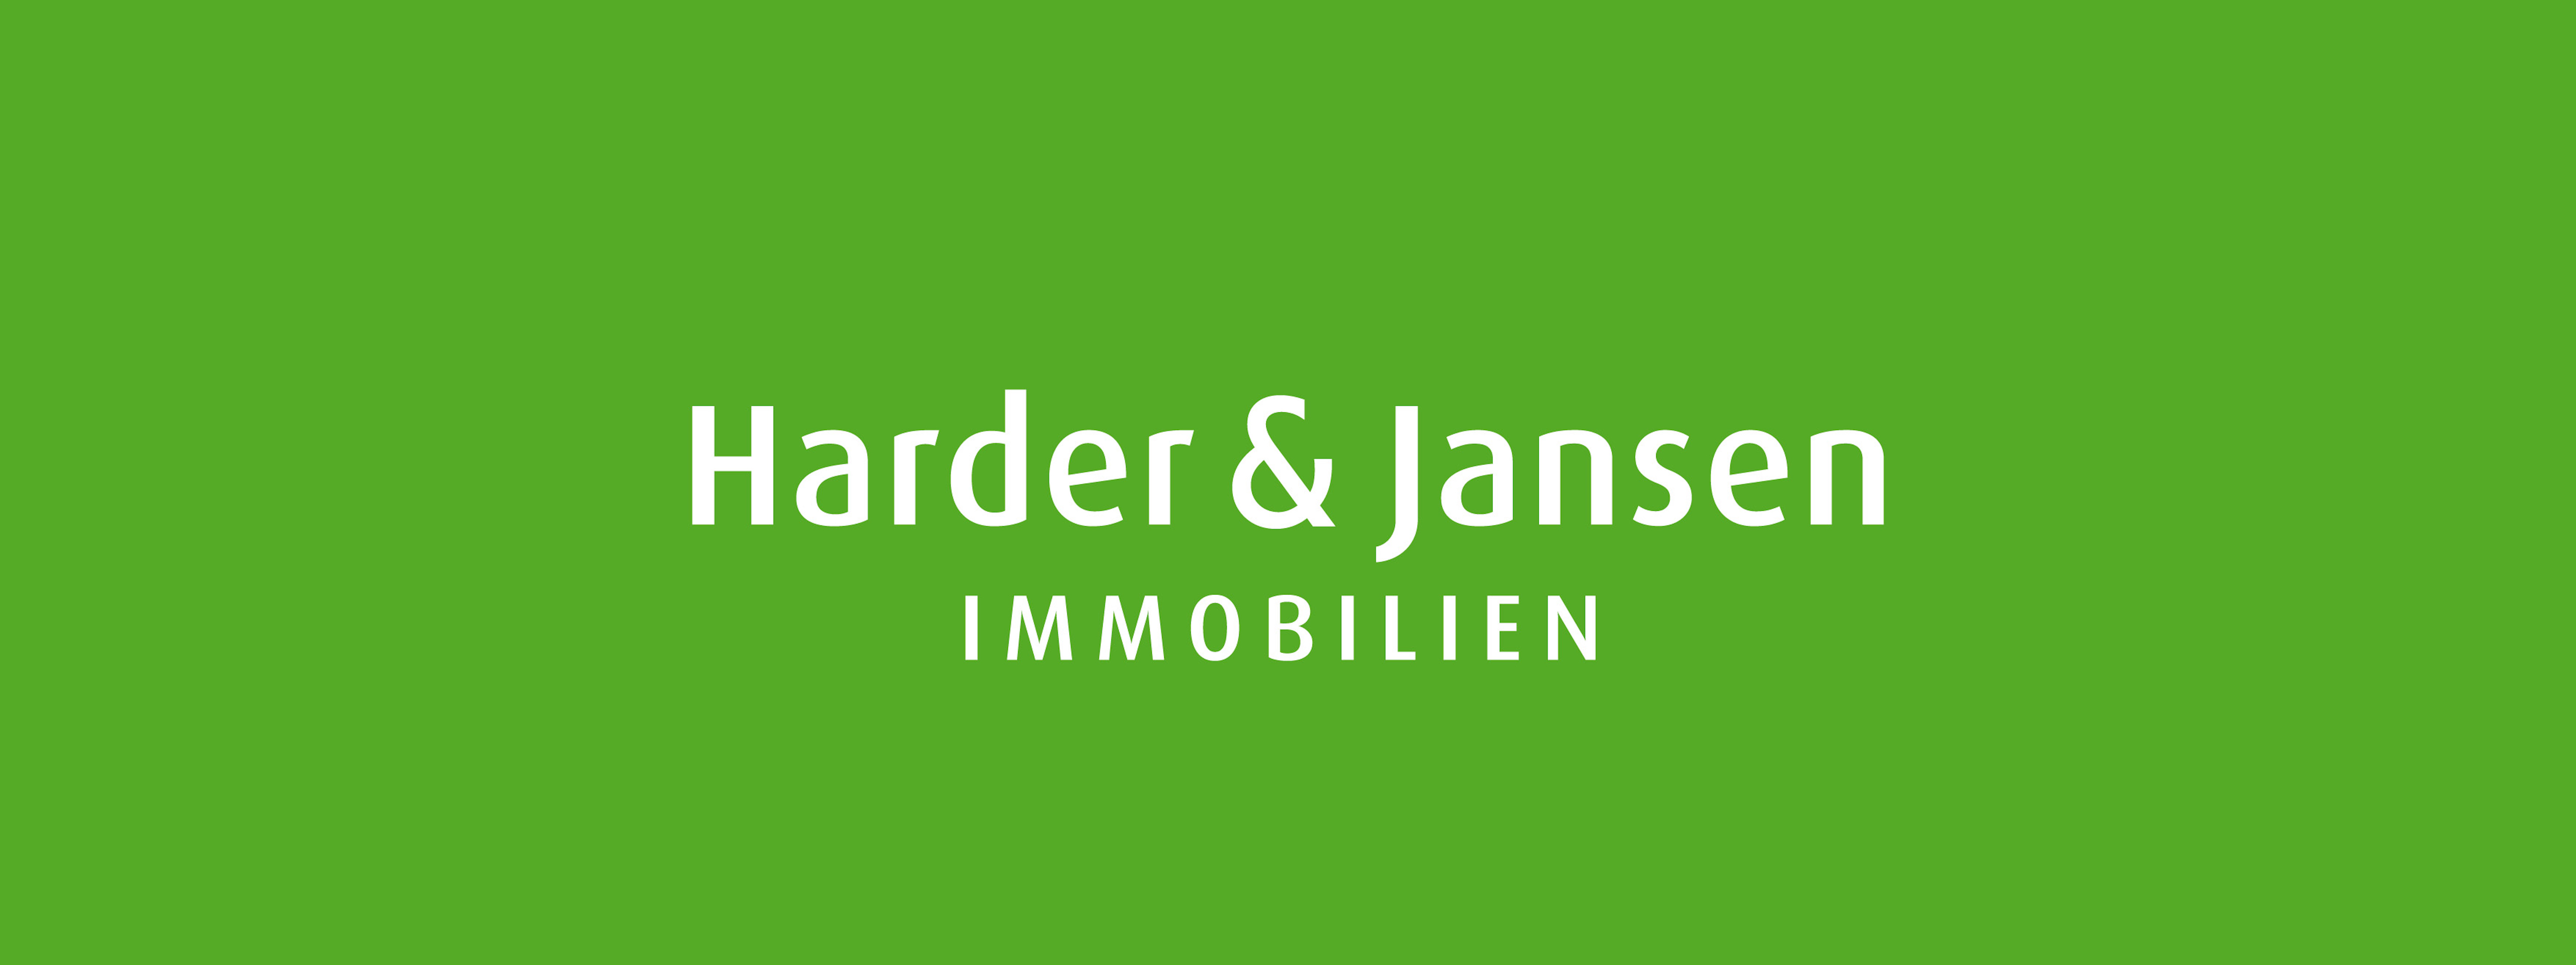 harder-jansen.de